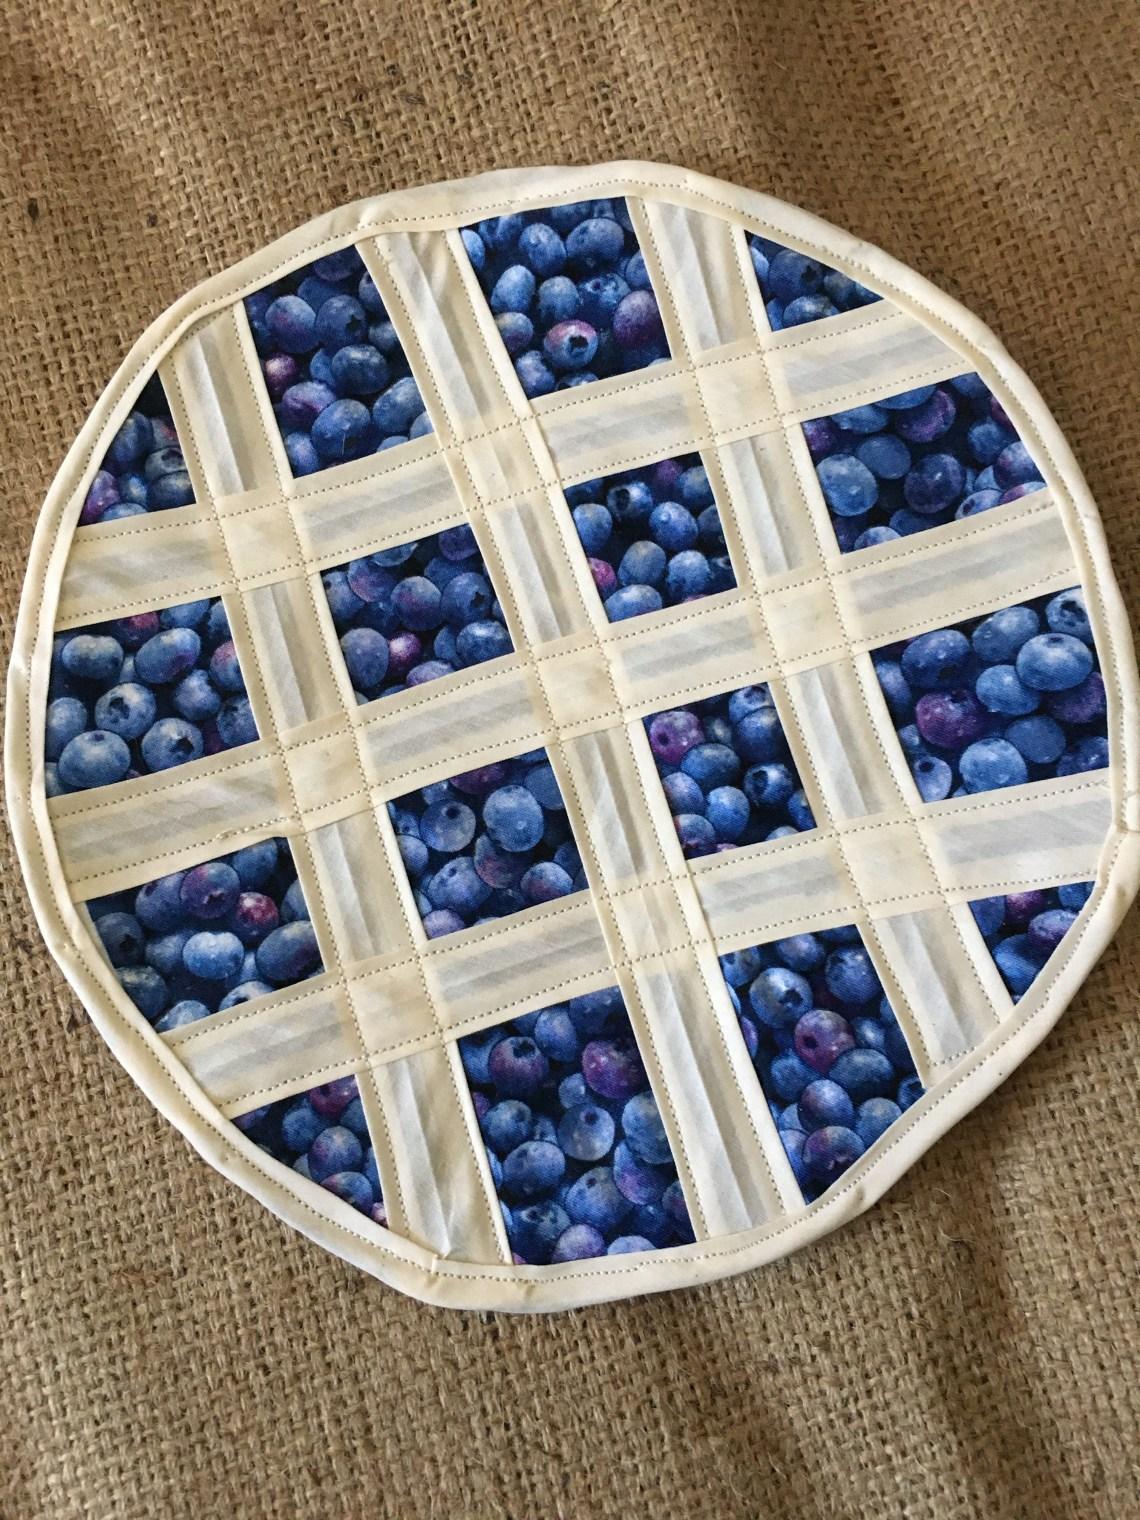 Blueberry pie shaped hot mat